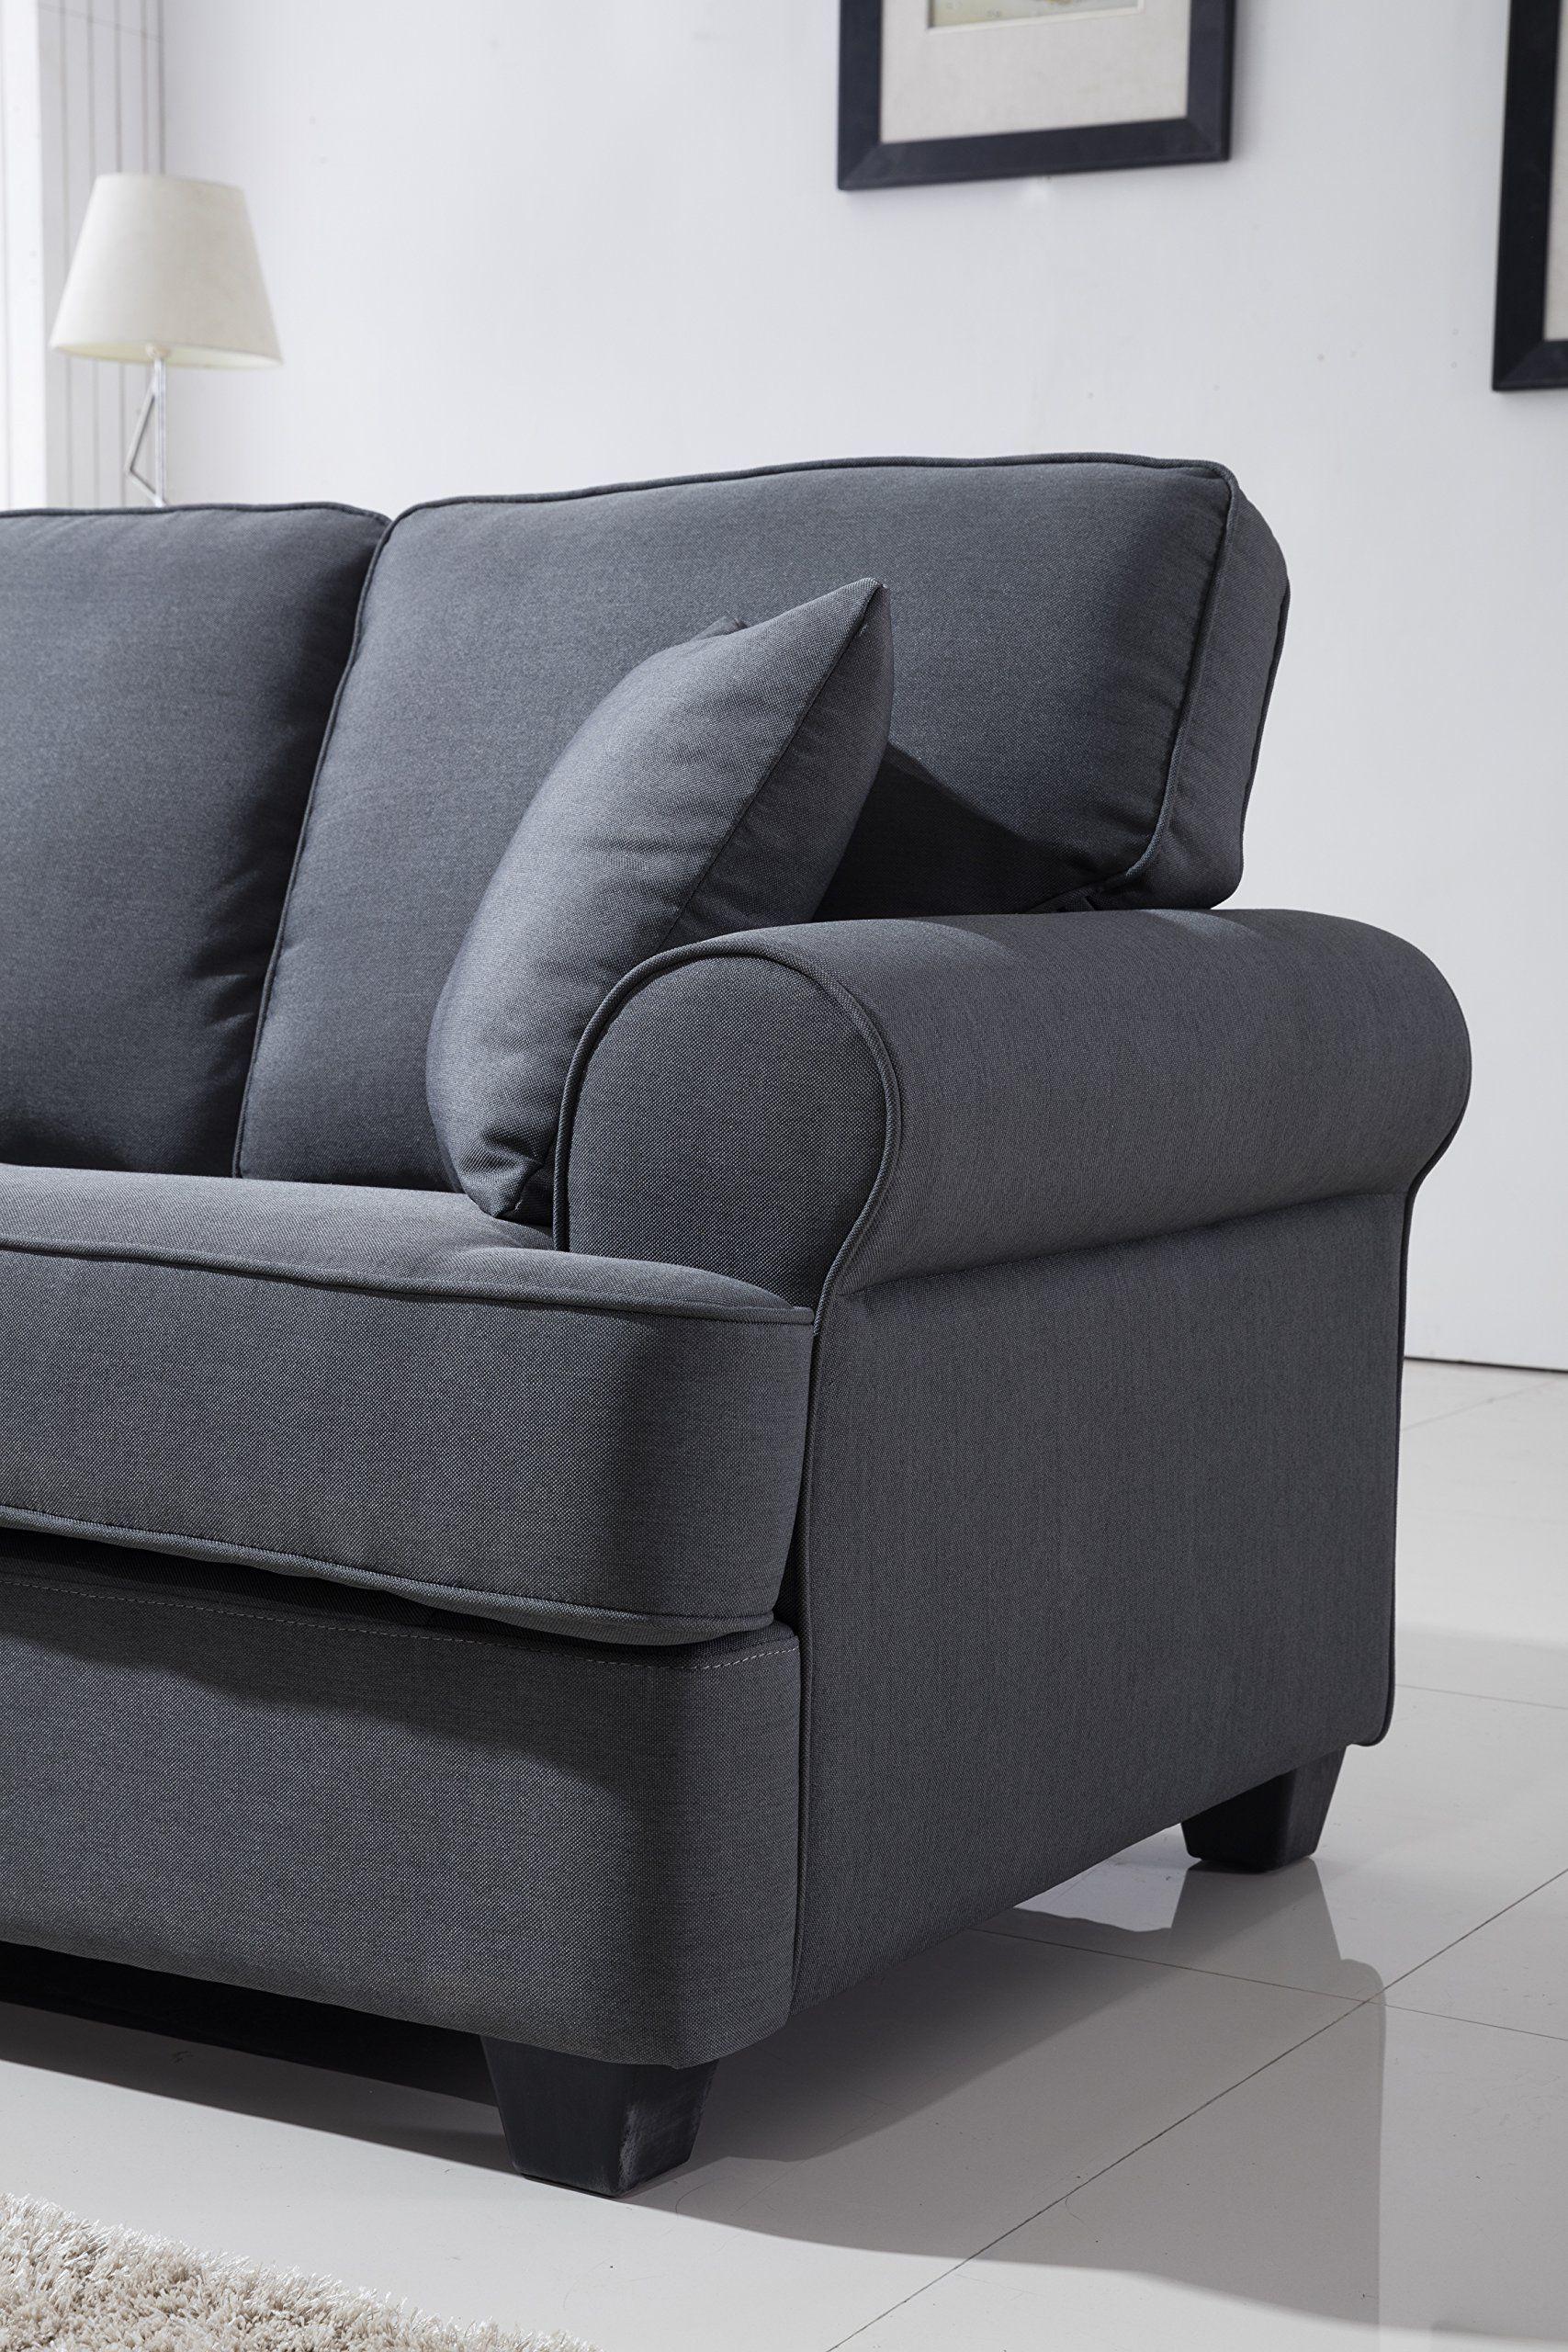 Dark grey living room classic plush fabric sofa living room furniture dark grey  many